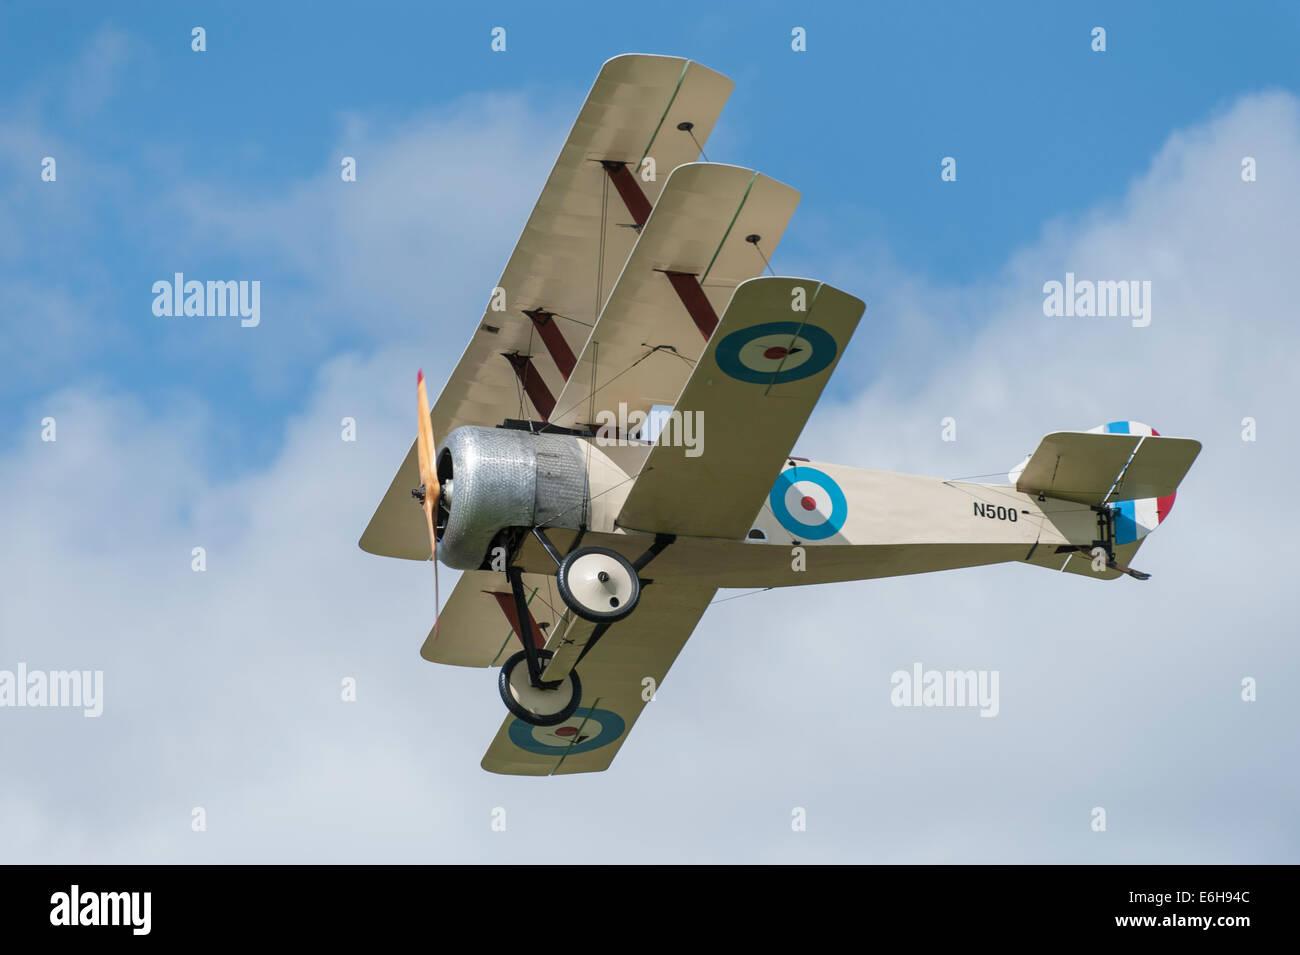 Dunsfold Aerodrome, Surrey UK. Saturday 23rd August 2014. Nieuport 17 WW1 bi-plane flying in the Great War Display - Stock Image